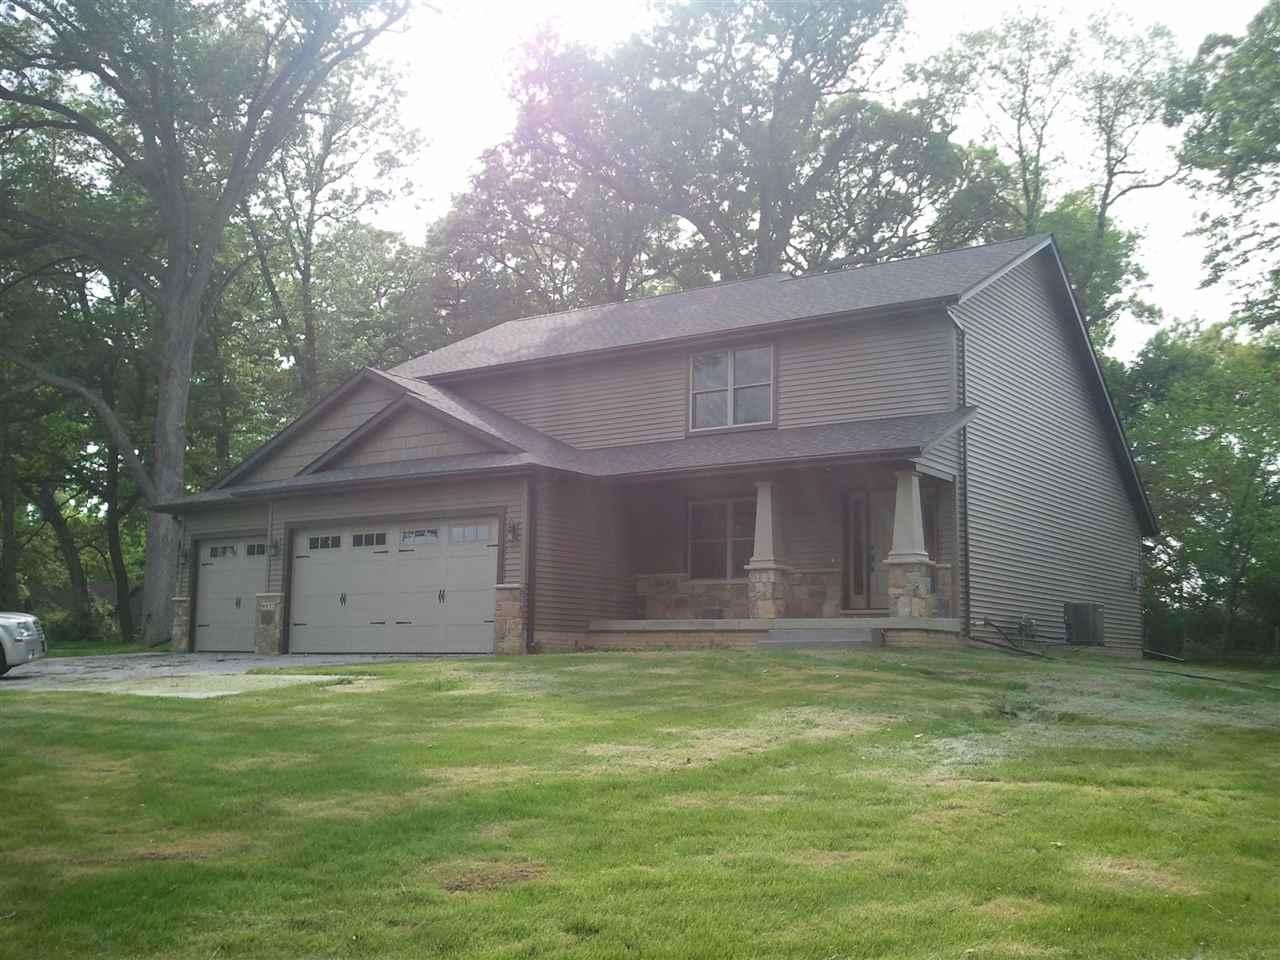 Real Estate for Sale, ListingId: 32744922, Davenport,IA52804